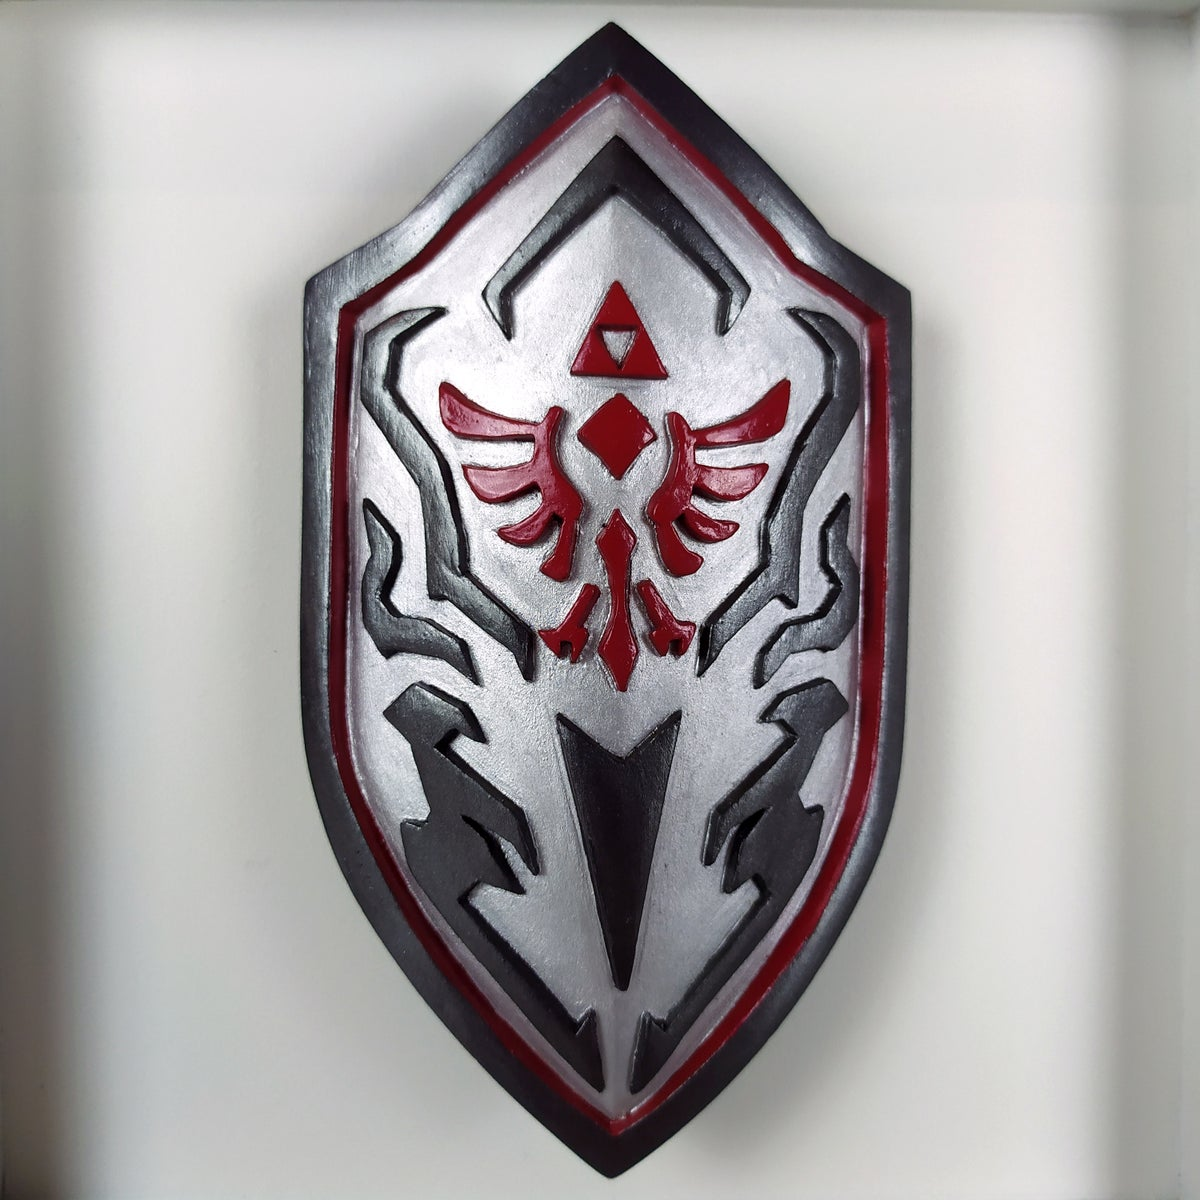 Image of Shields Zelda Breath Of The Wild - Royal Guard's Shield